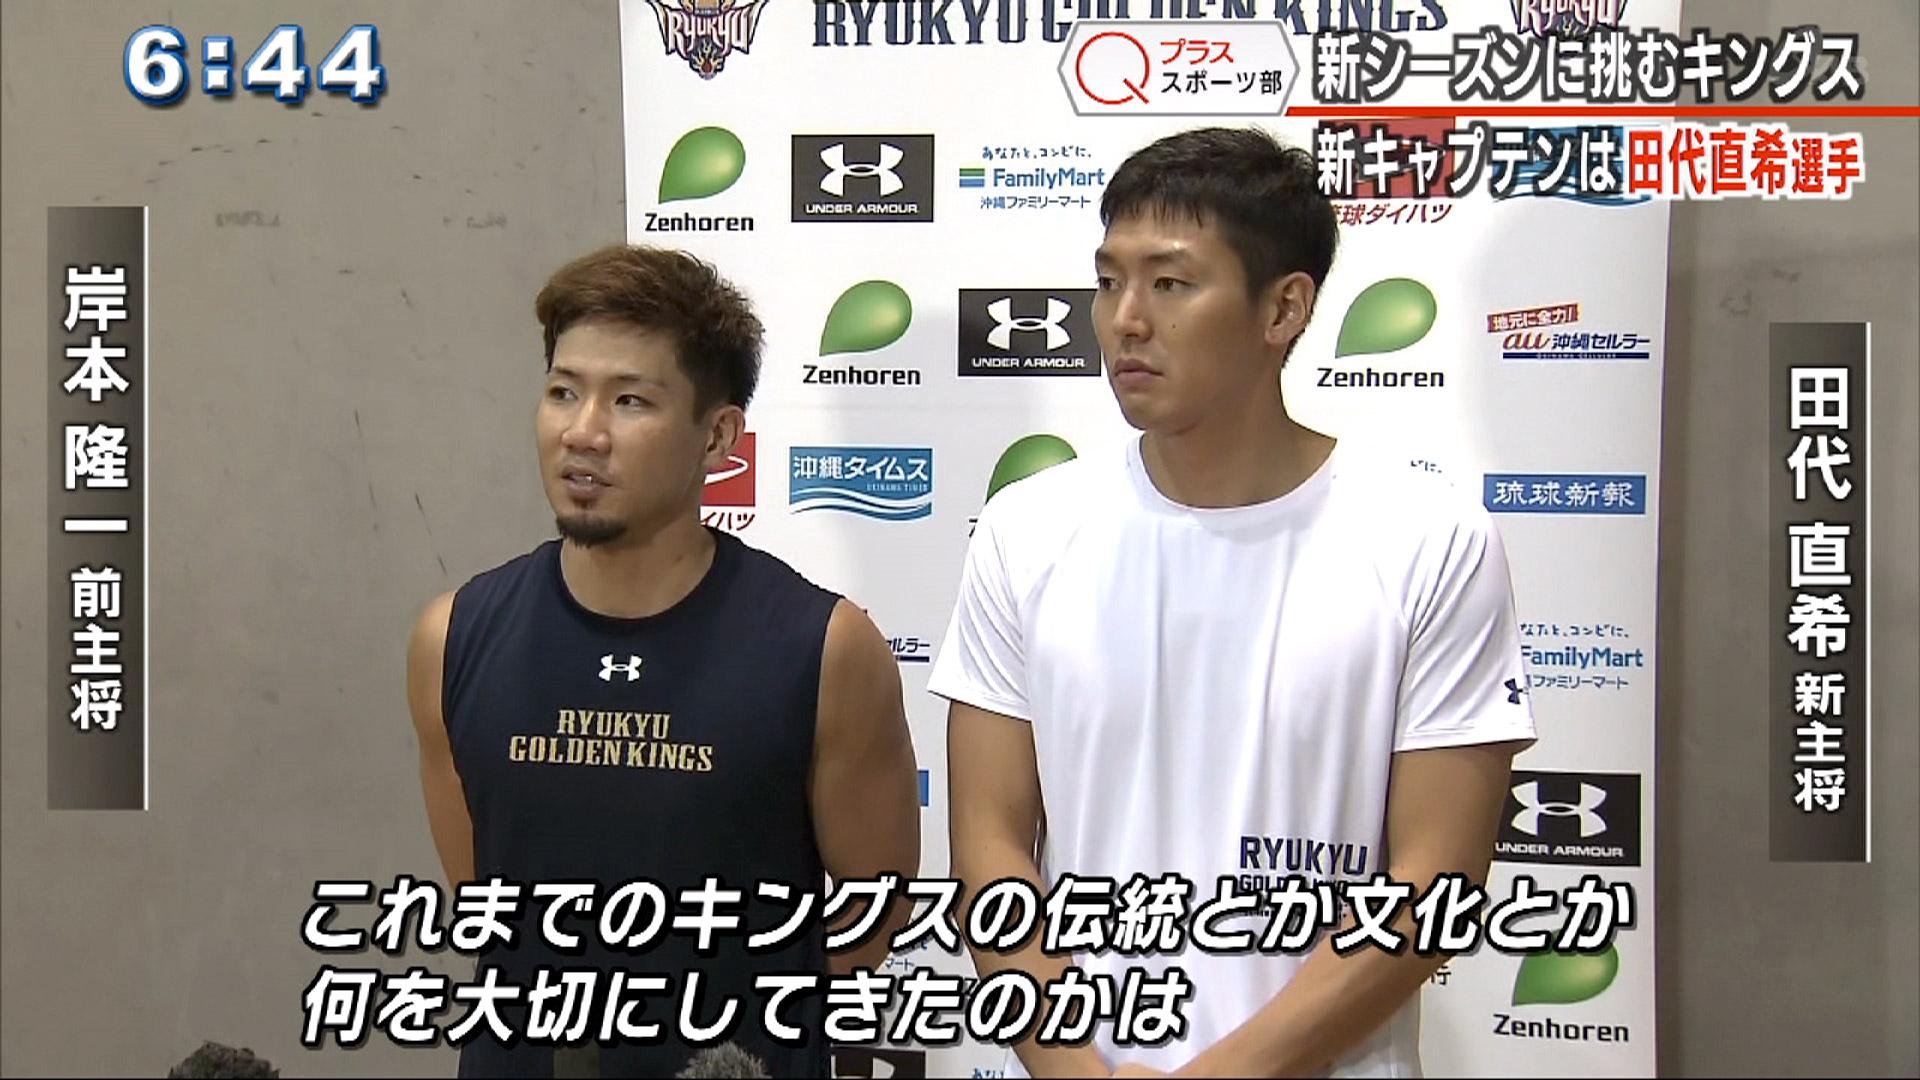 Qプラススポーツ部 新シーズンに挑むキングス 新キャプテンは田代直希選手